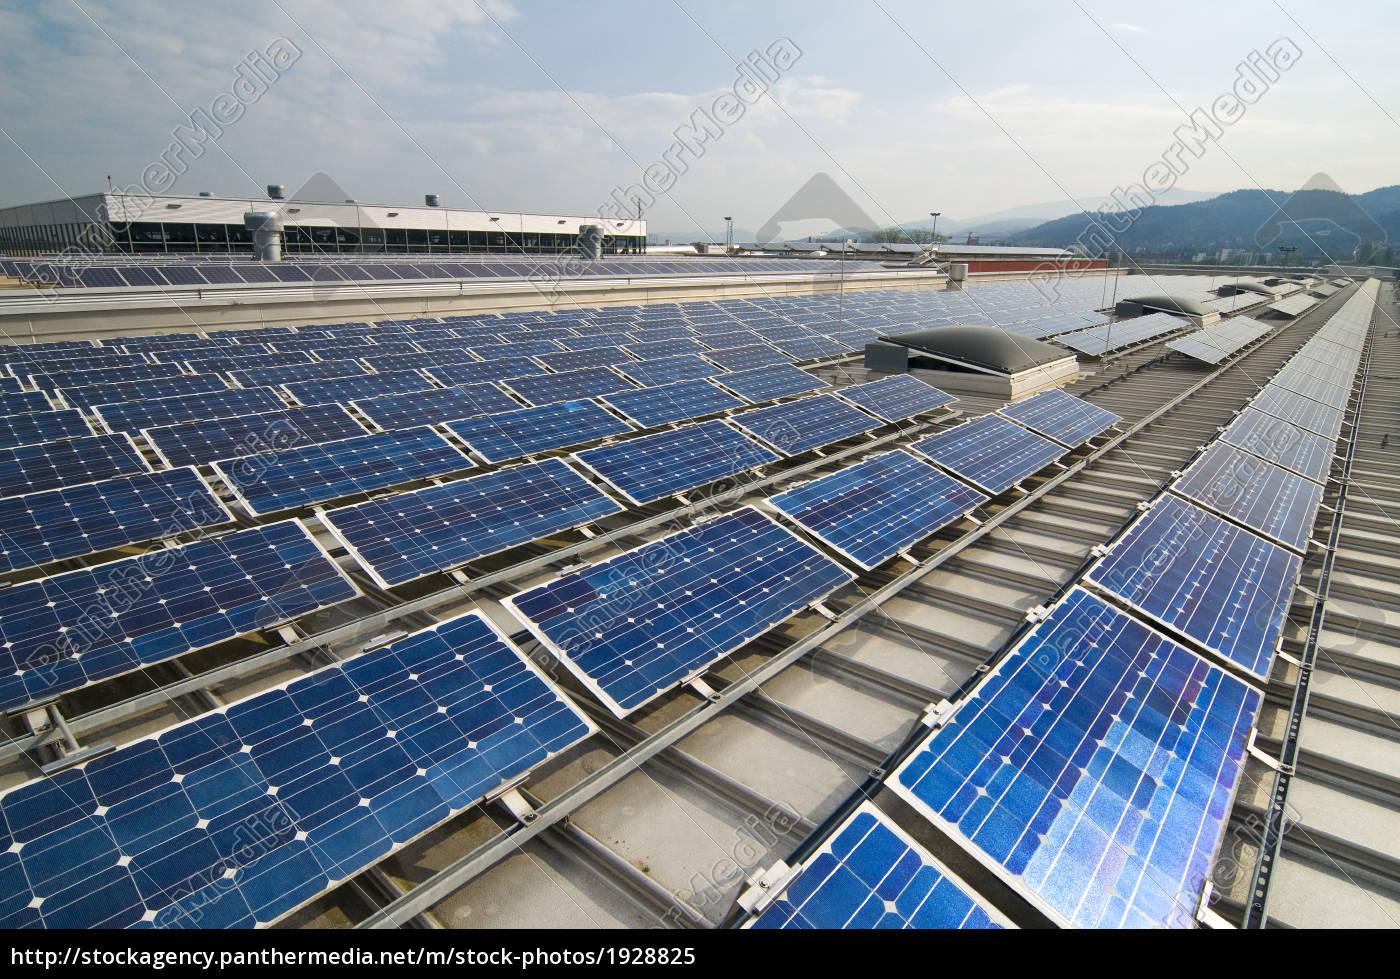 solaranlage03 - 1928825